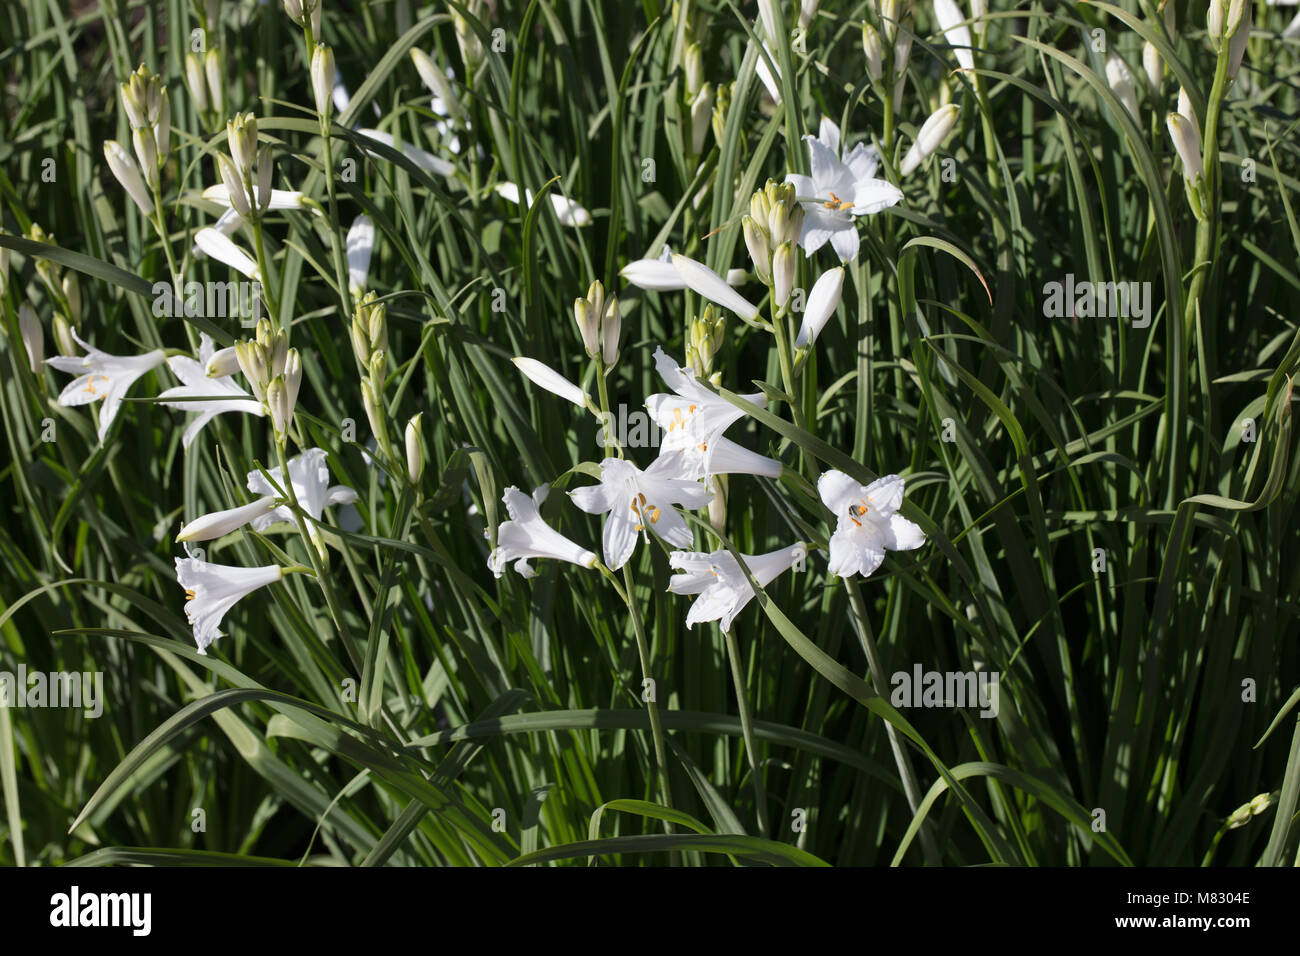 St. Bruno's lily, Paradislilja (Paradisea liliastrum) - Stock Image